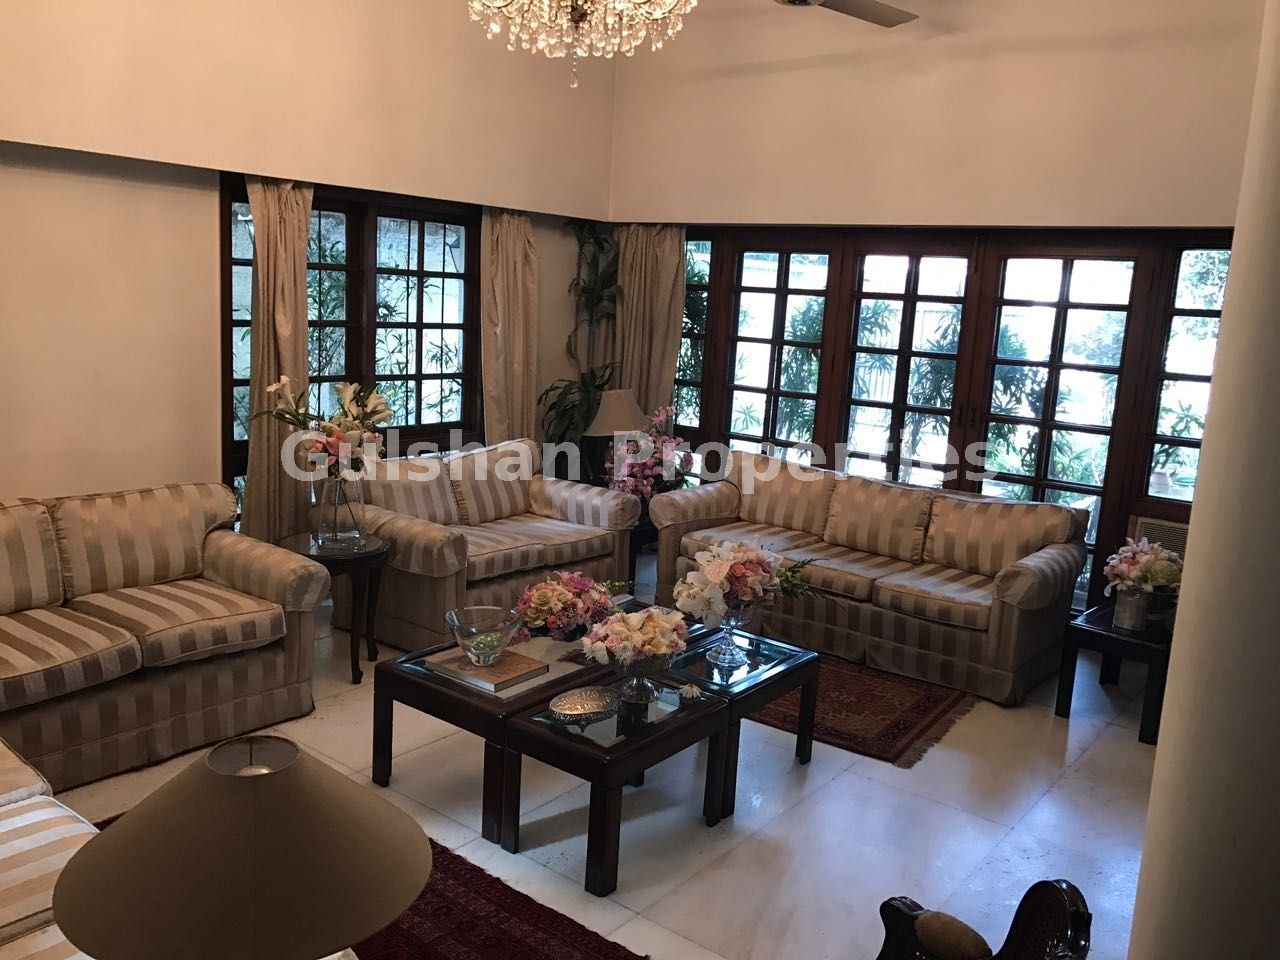 Commercial Space For Rent Location Lajpat Nagar IV New Delhi Floor Ground 700000 PM Super Area 4000 Sqft